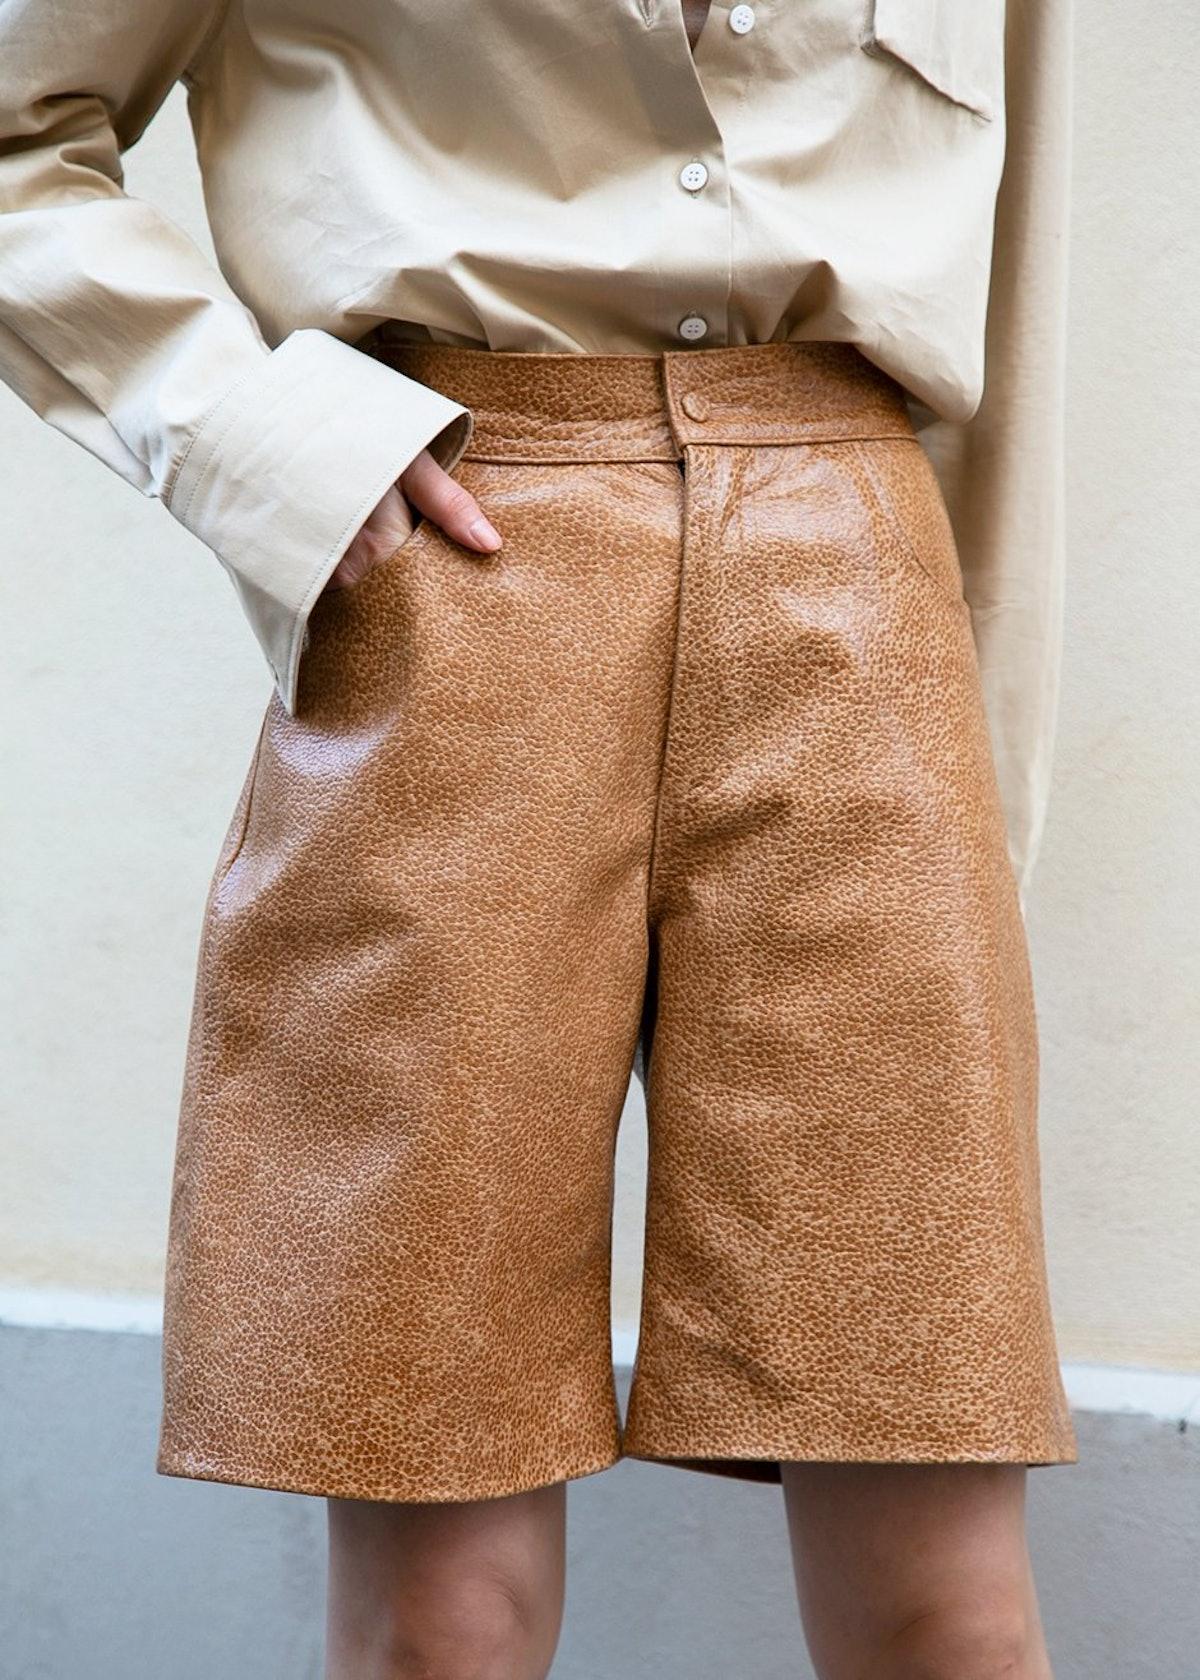 Bermuda Shorts In Dark Camel Embossed Leather